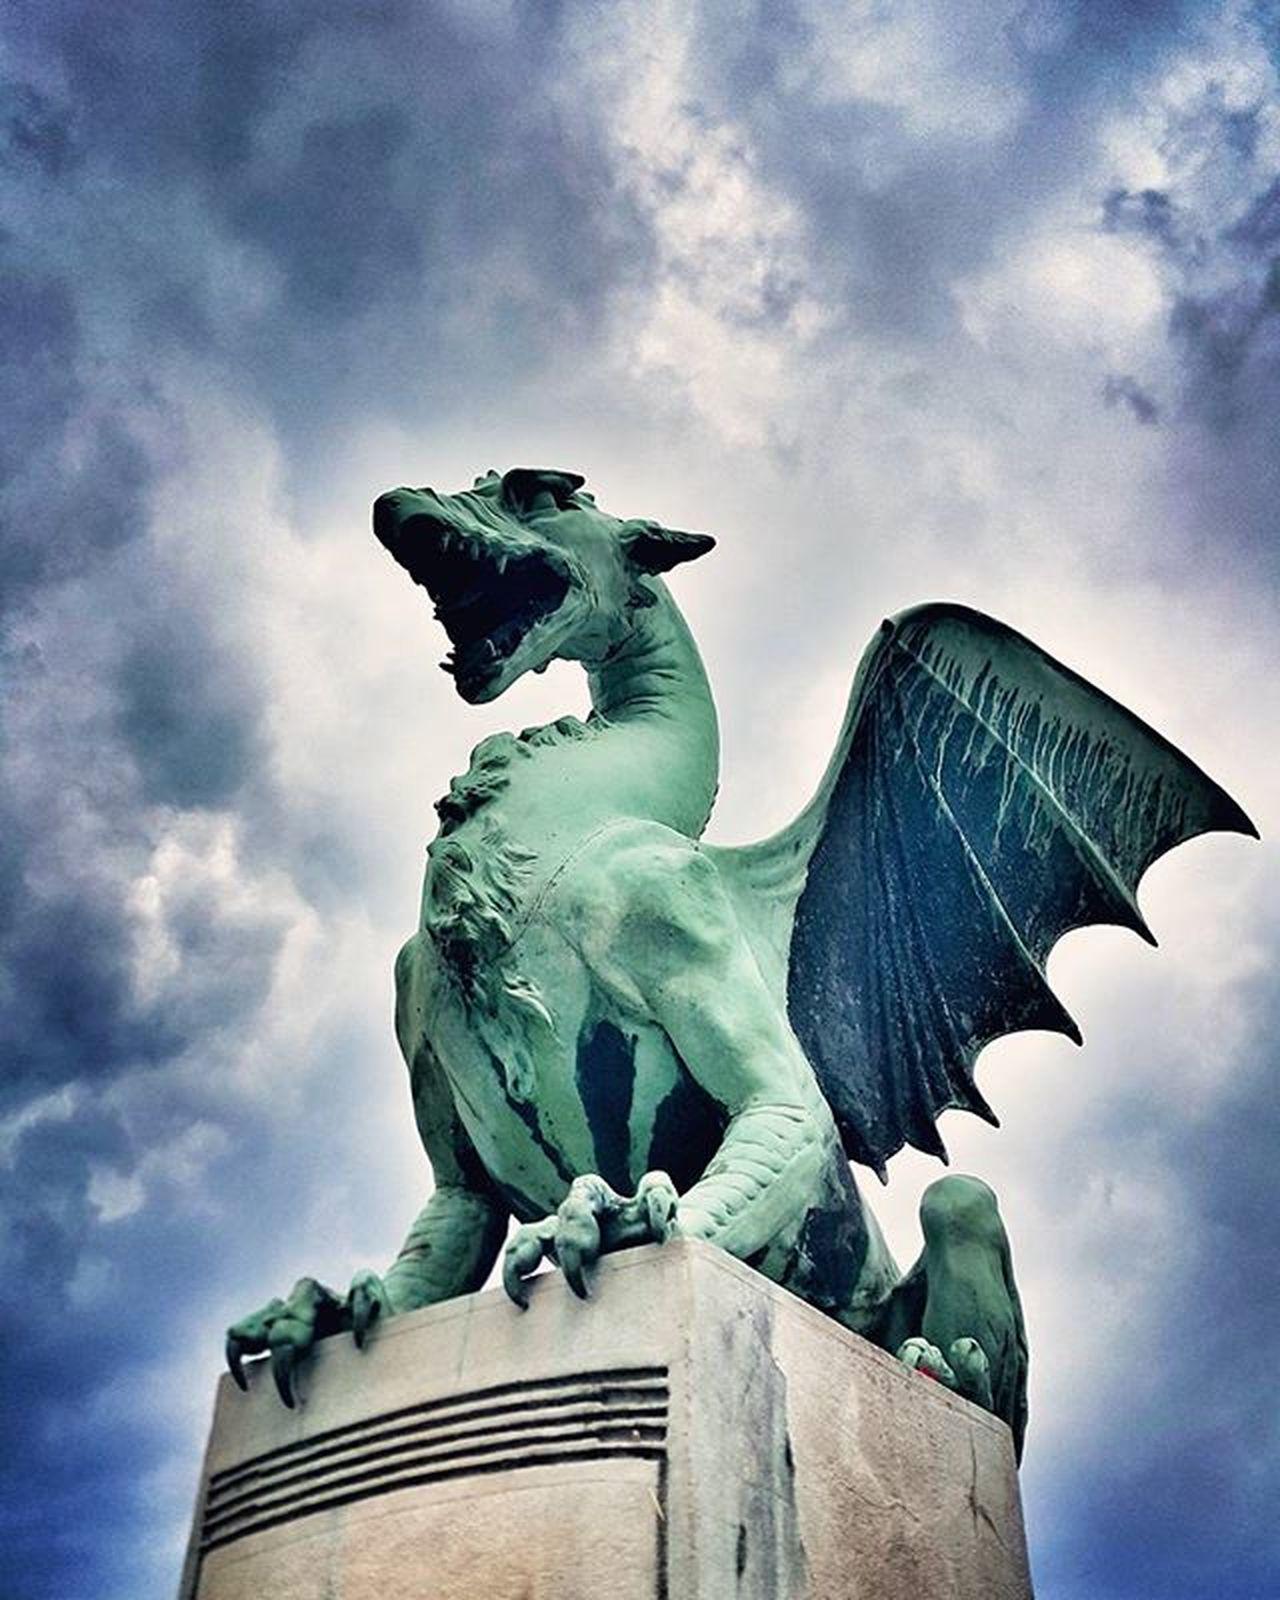 Dragon Ljubljana Visitljubljana Igljubljana Igslovenia Slovenia Iloveslovenia Dragonbridge Visitslovenia Zmajskimost IfeelsLOVEnia